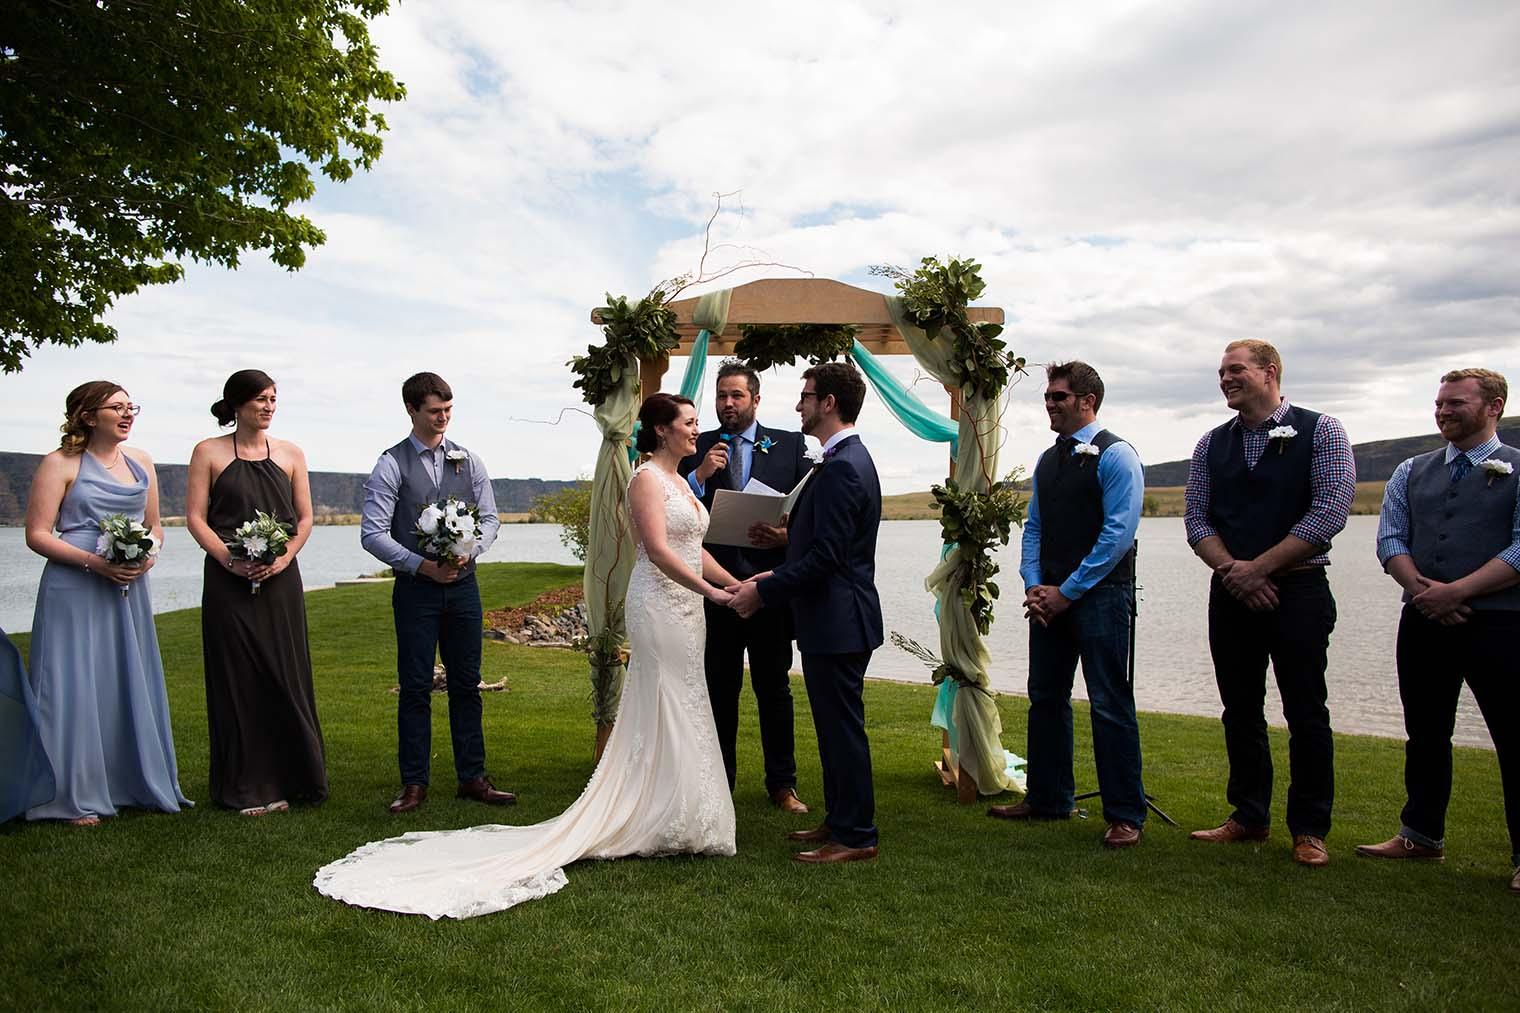 Wedding Photographer located in Wenatchee WA